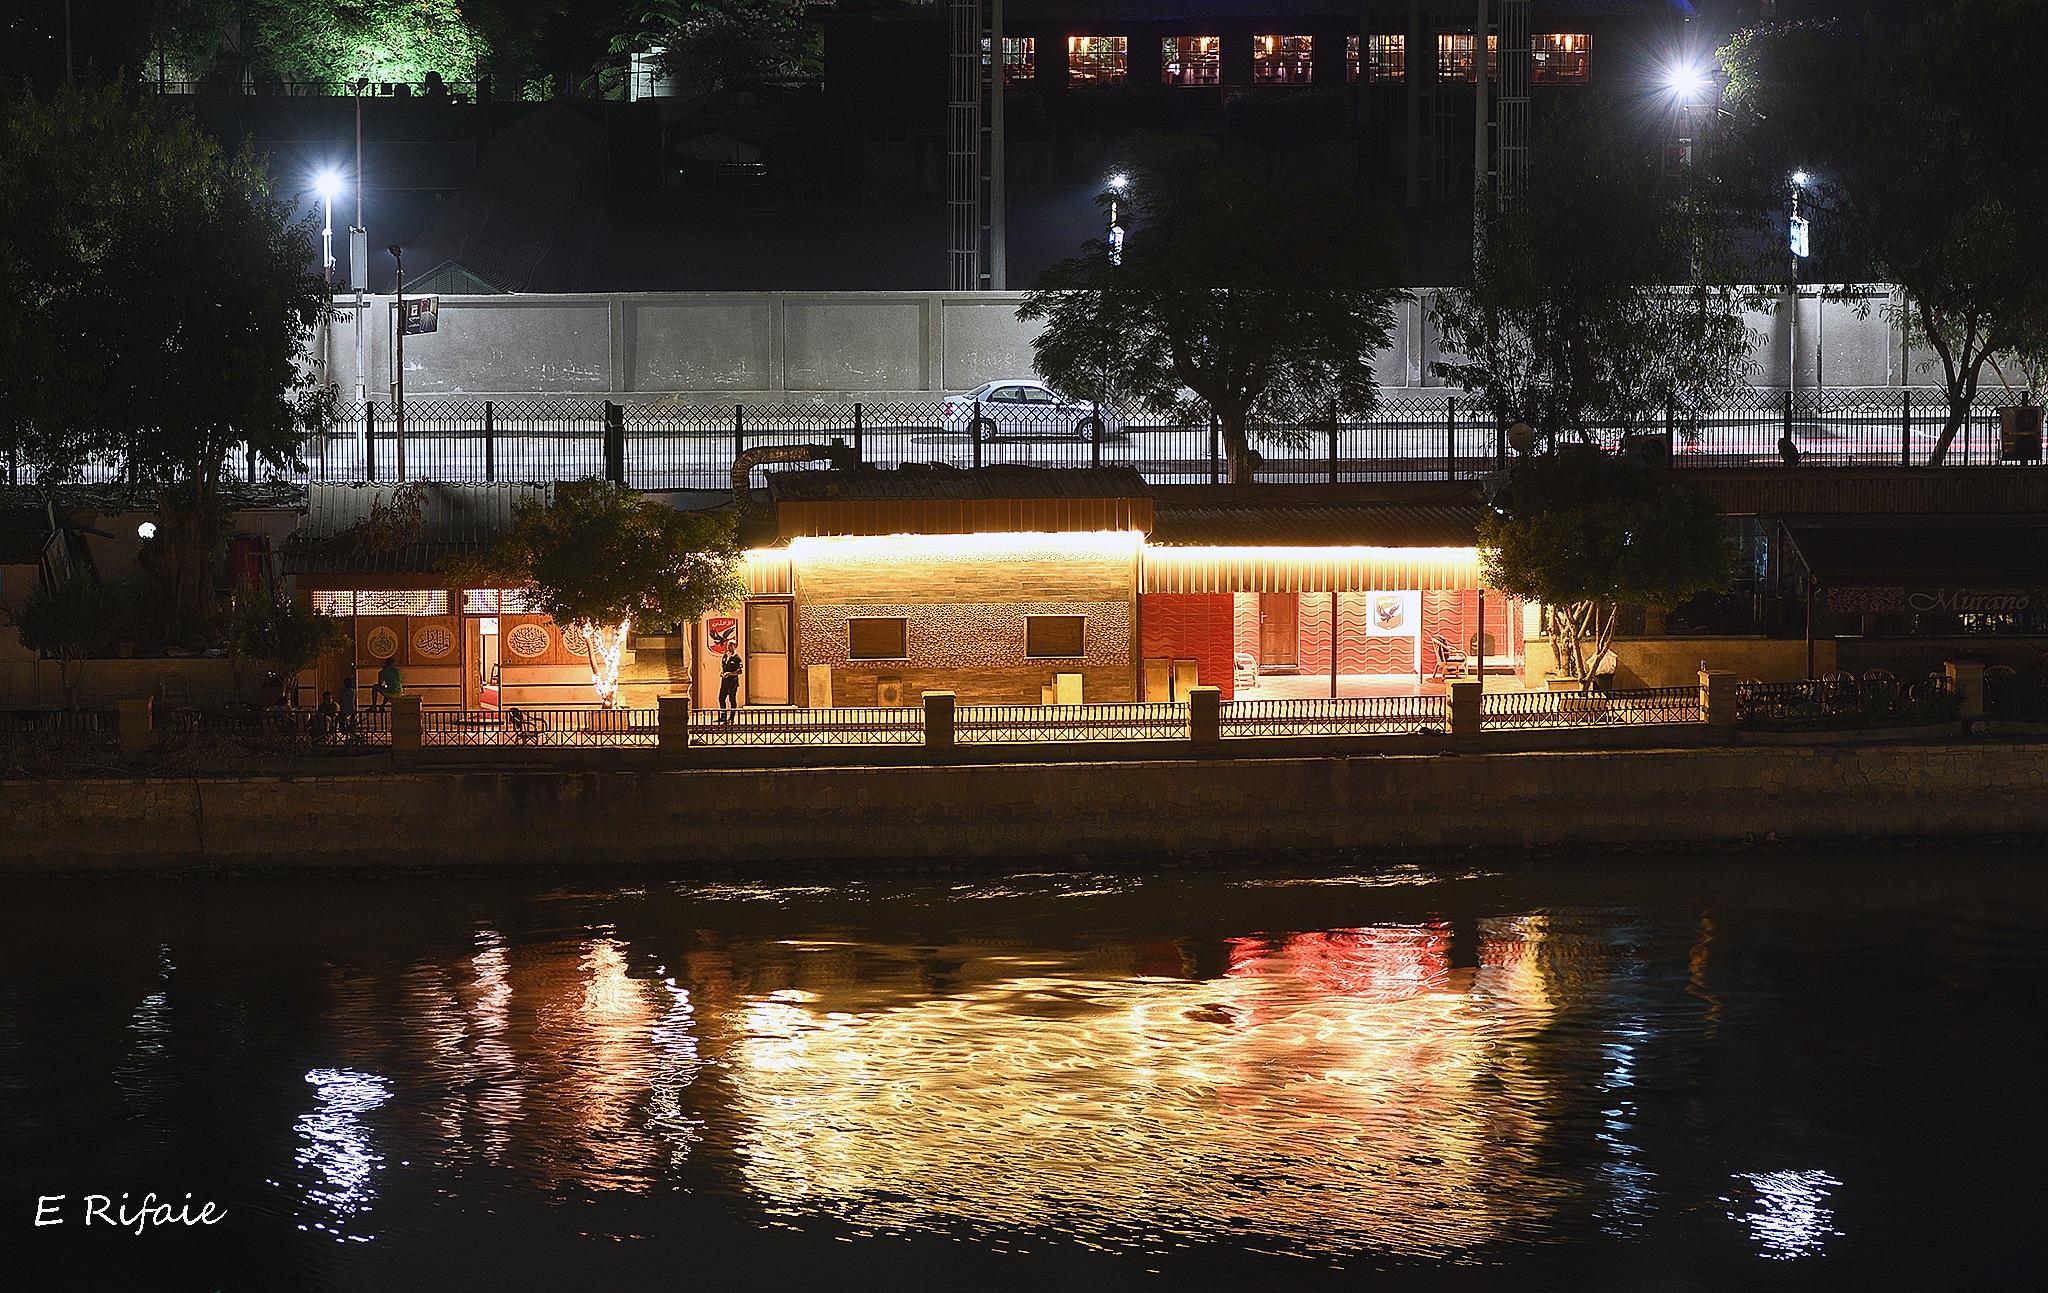 Nile night by Emad Eldin Moustafa El Refaie